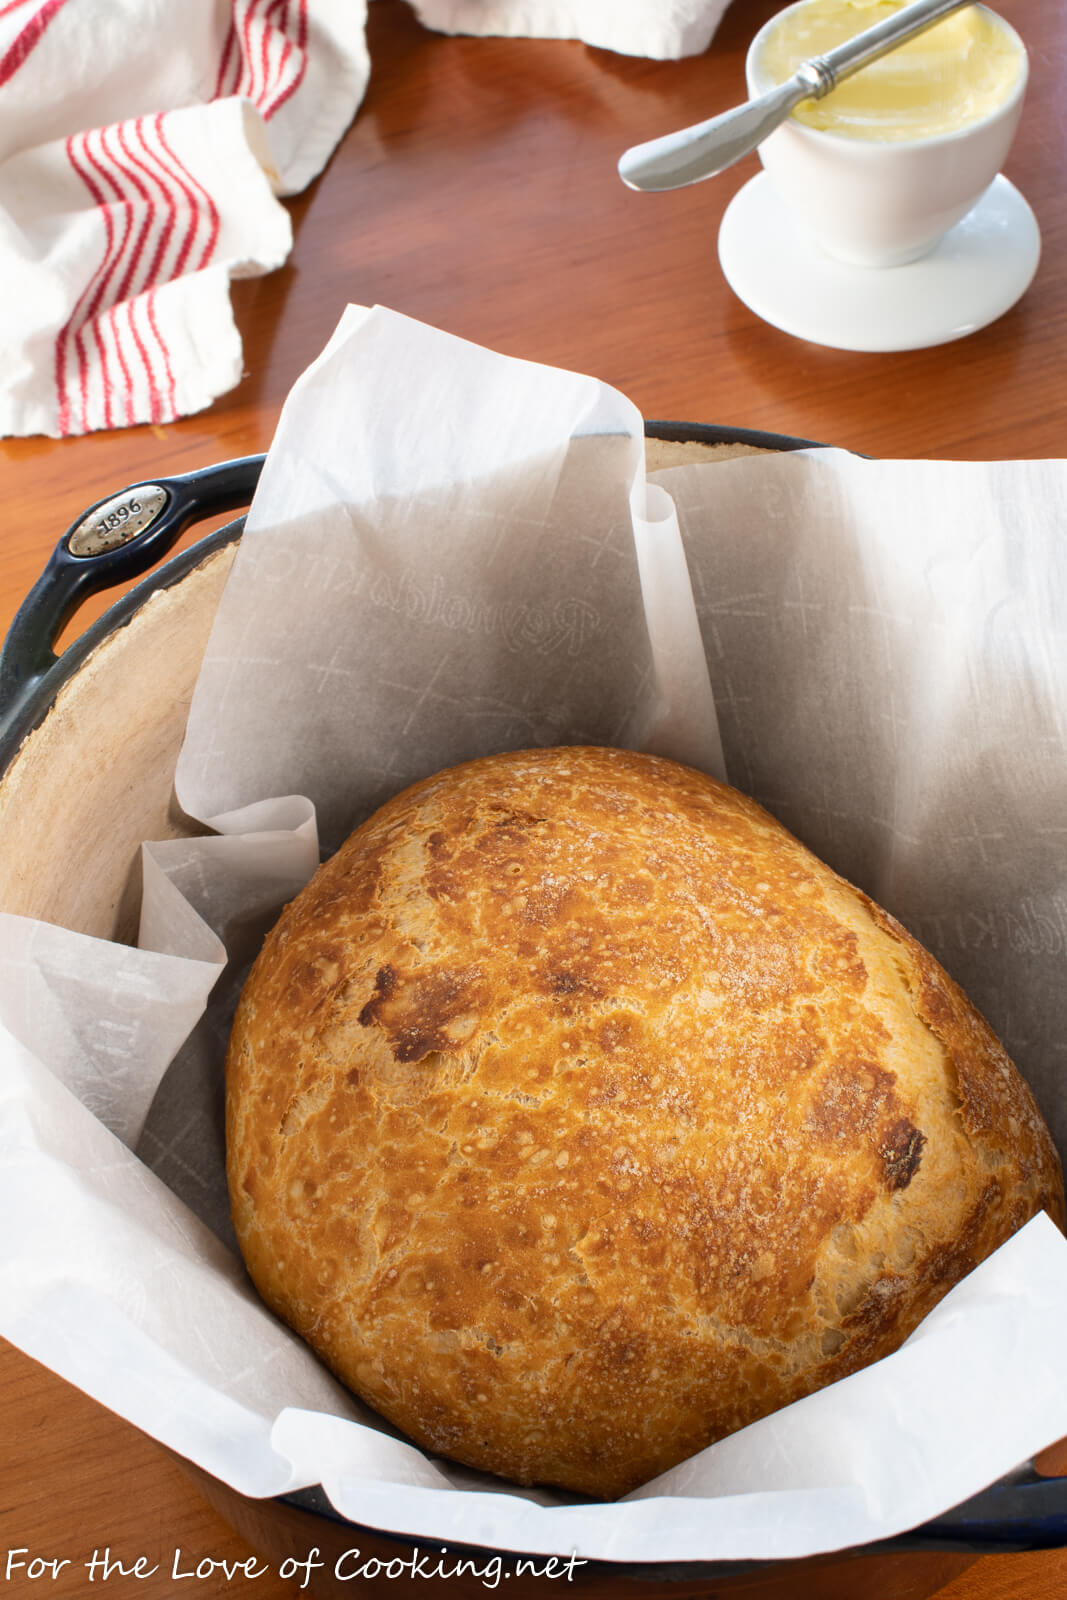 No-Knead Rustic Bread with Roasted Garlic